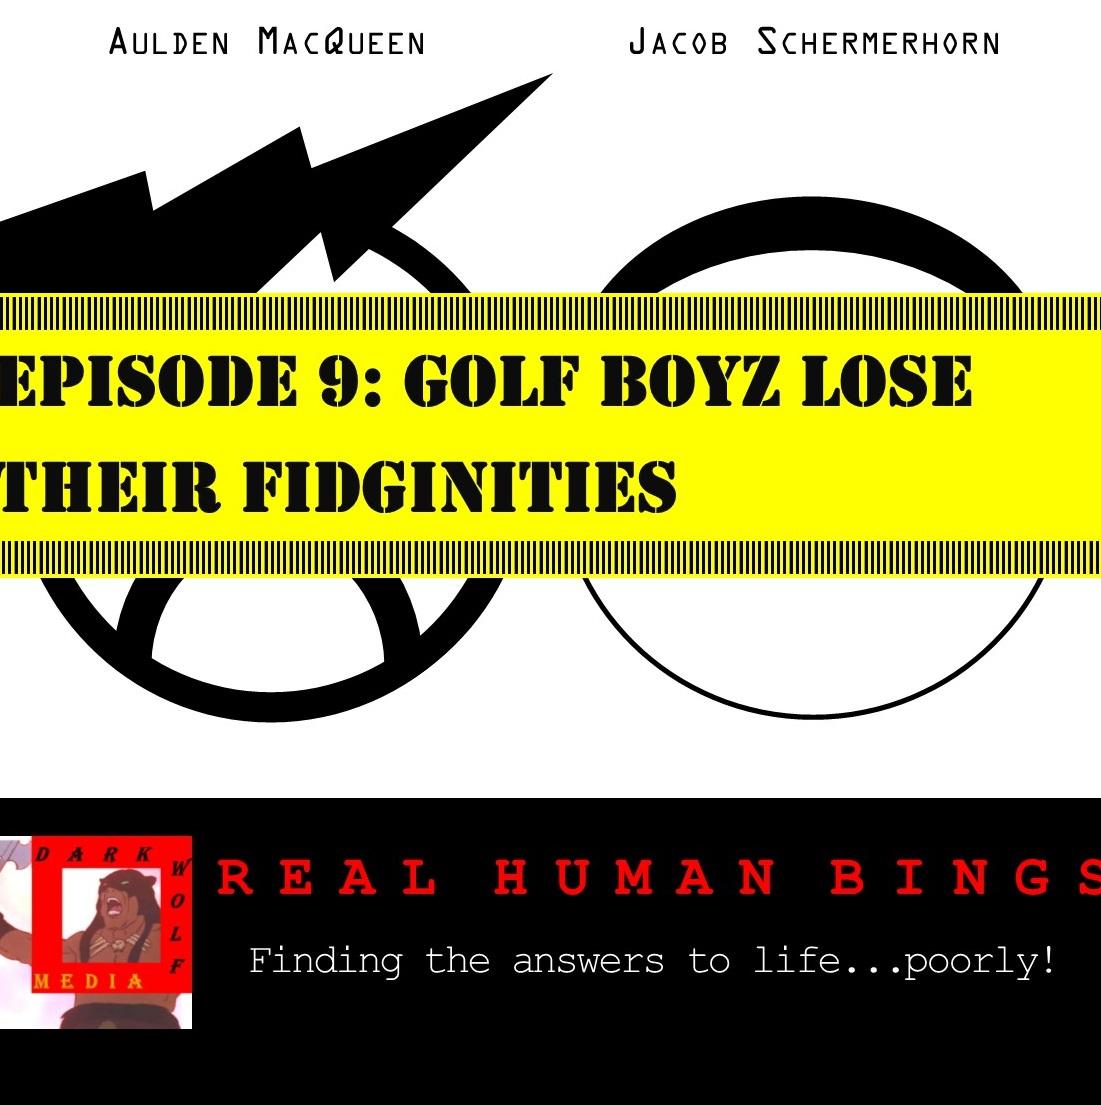 Episode 9 Cover.jpg